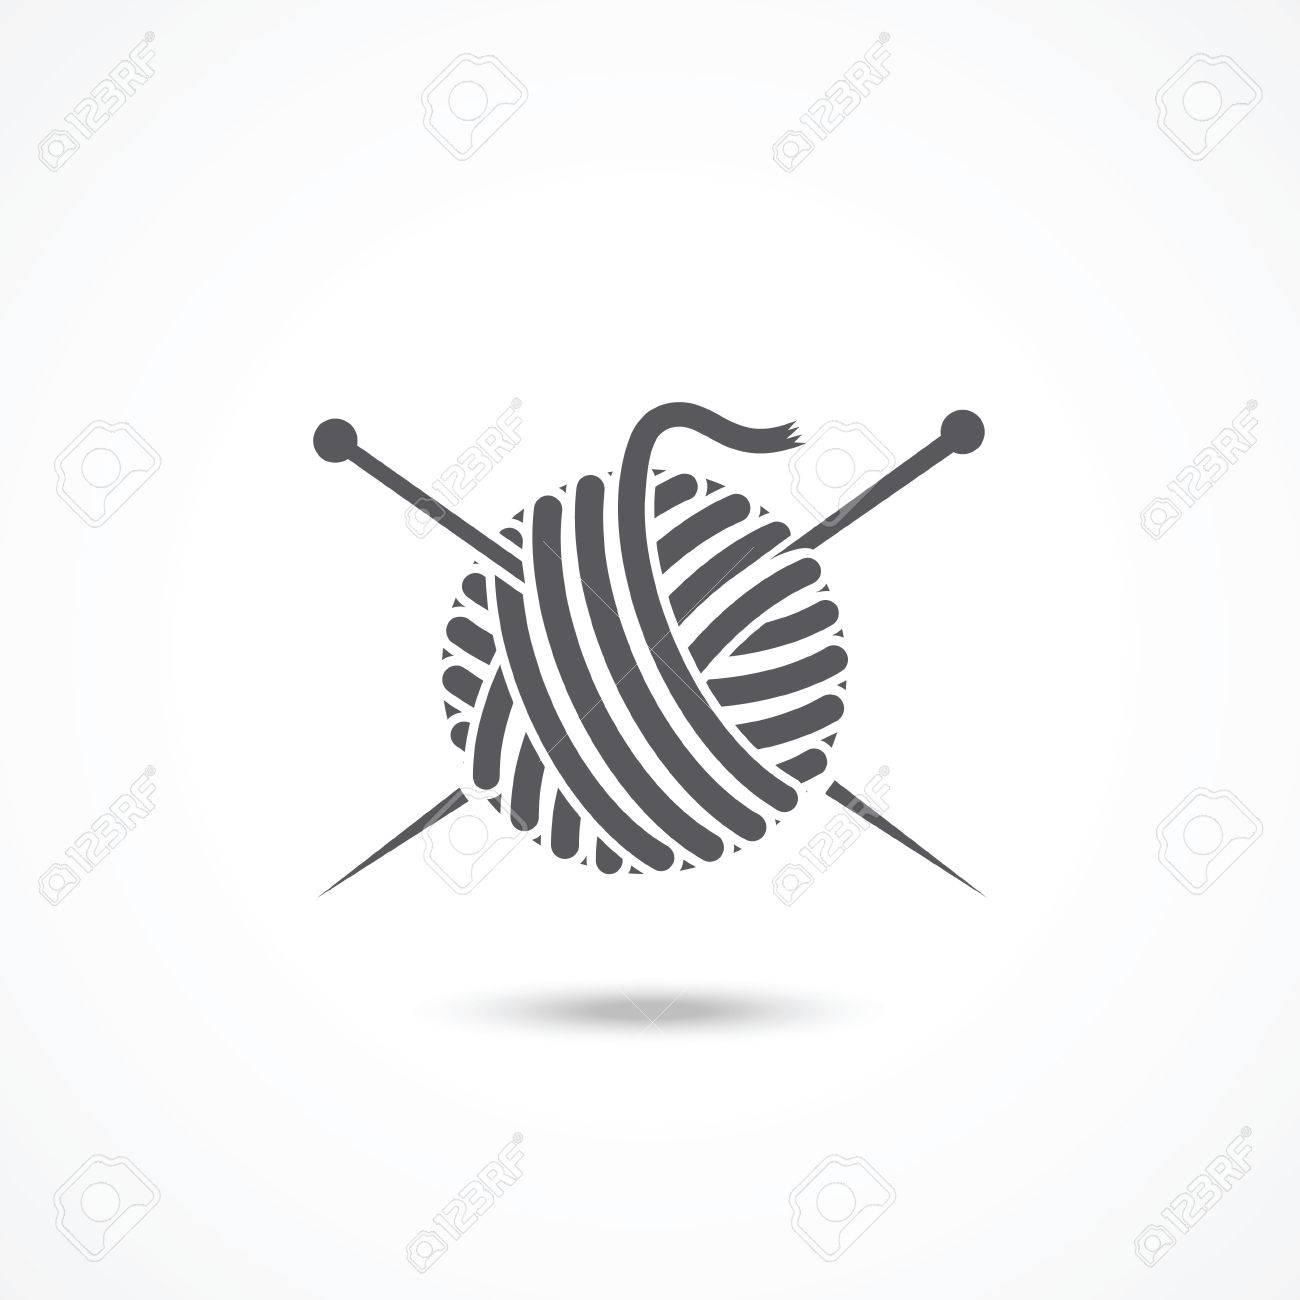 Yarn ball and needles icon - 39448110